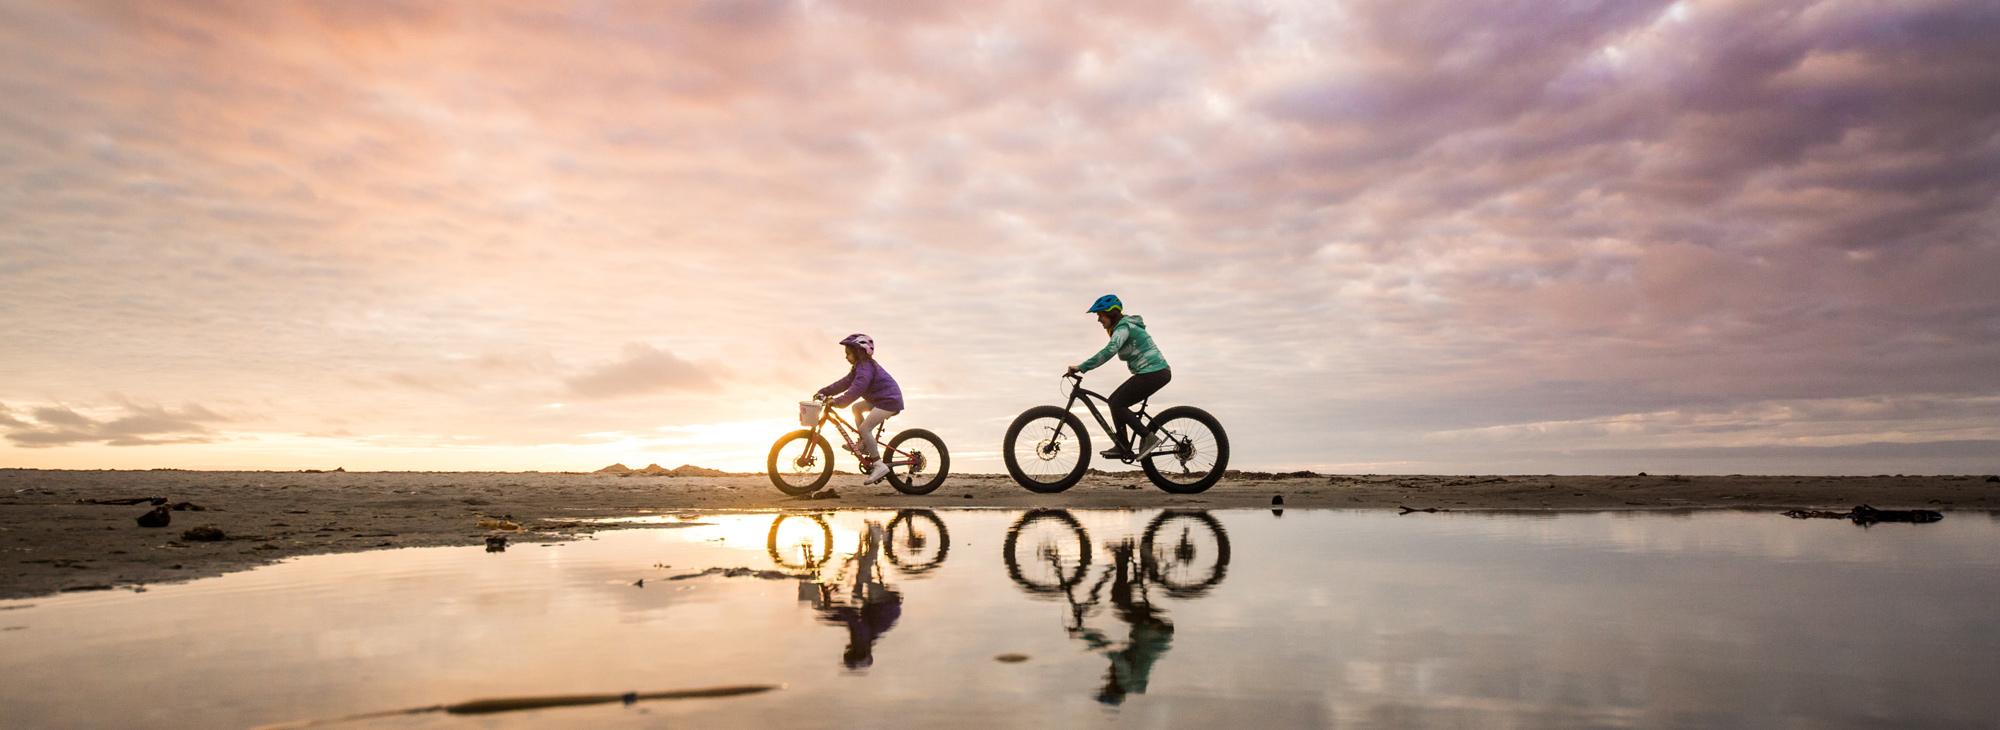 Central_Coast_Fatbike_Roads_End_VanWeelden_18-HERO.jpg